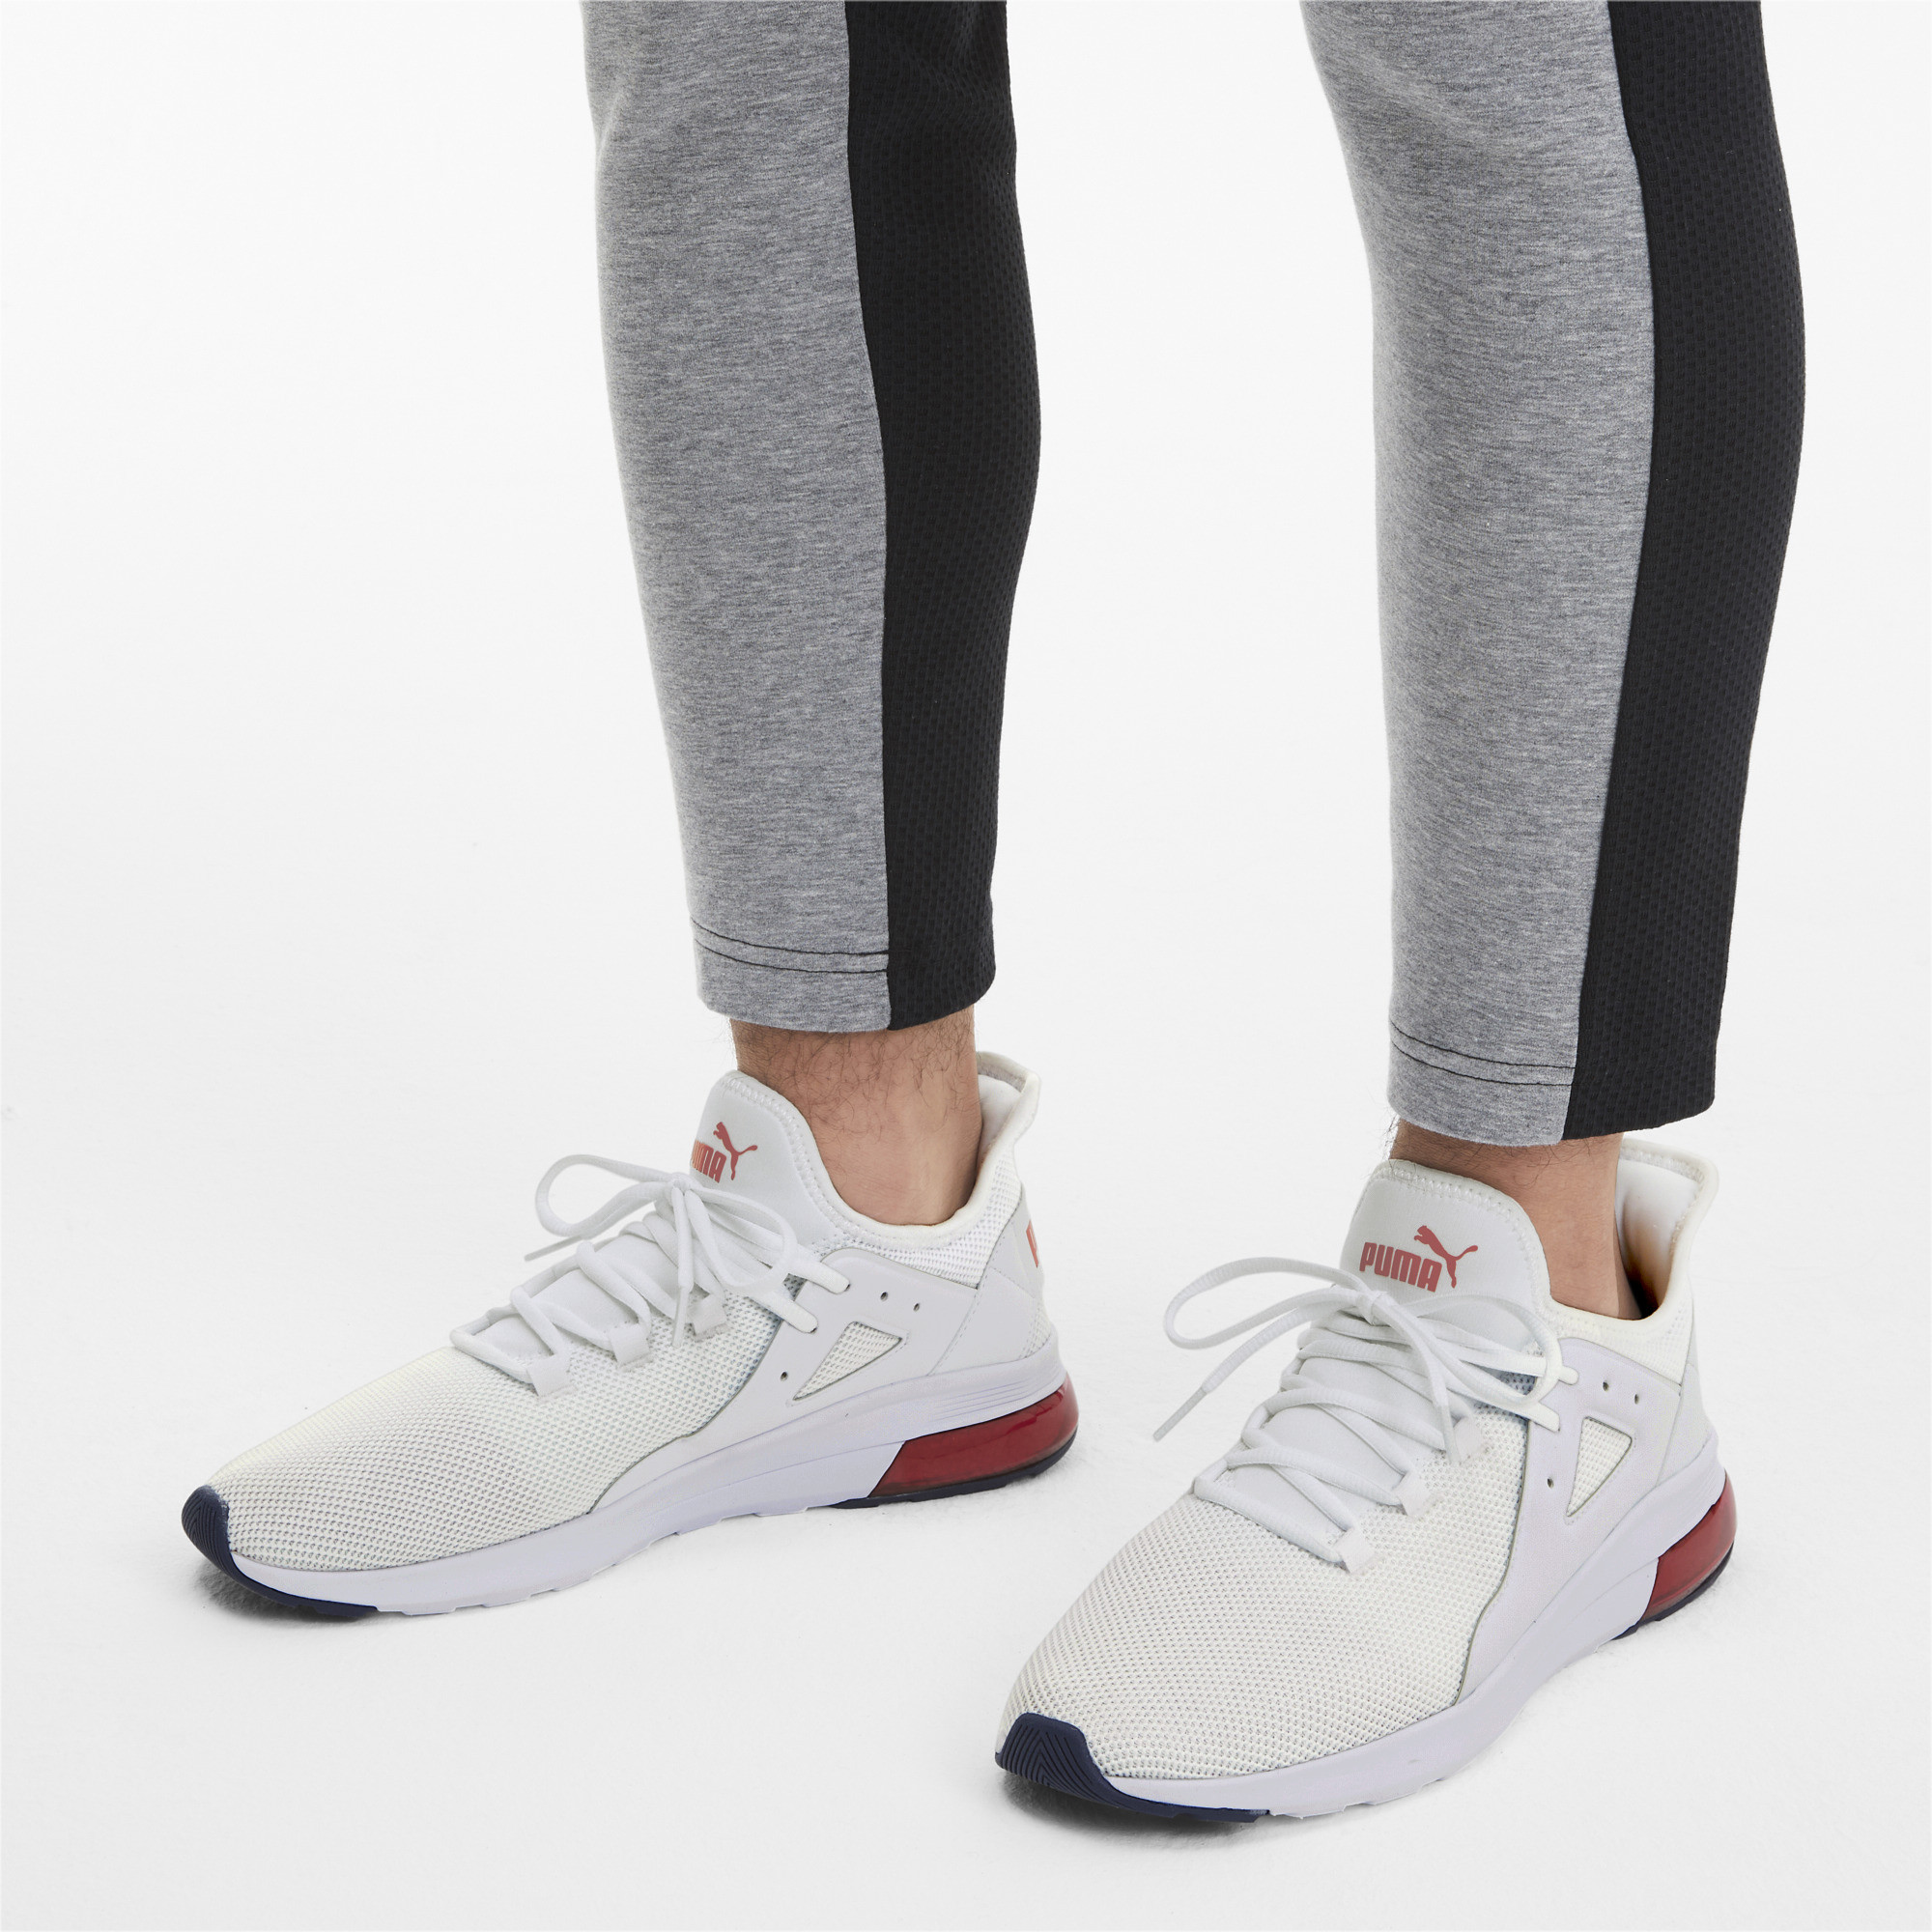 PUMA-Men-039-s-Electron-Street-Sneakers thumbnail 15